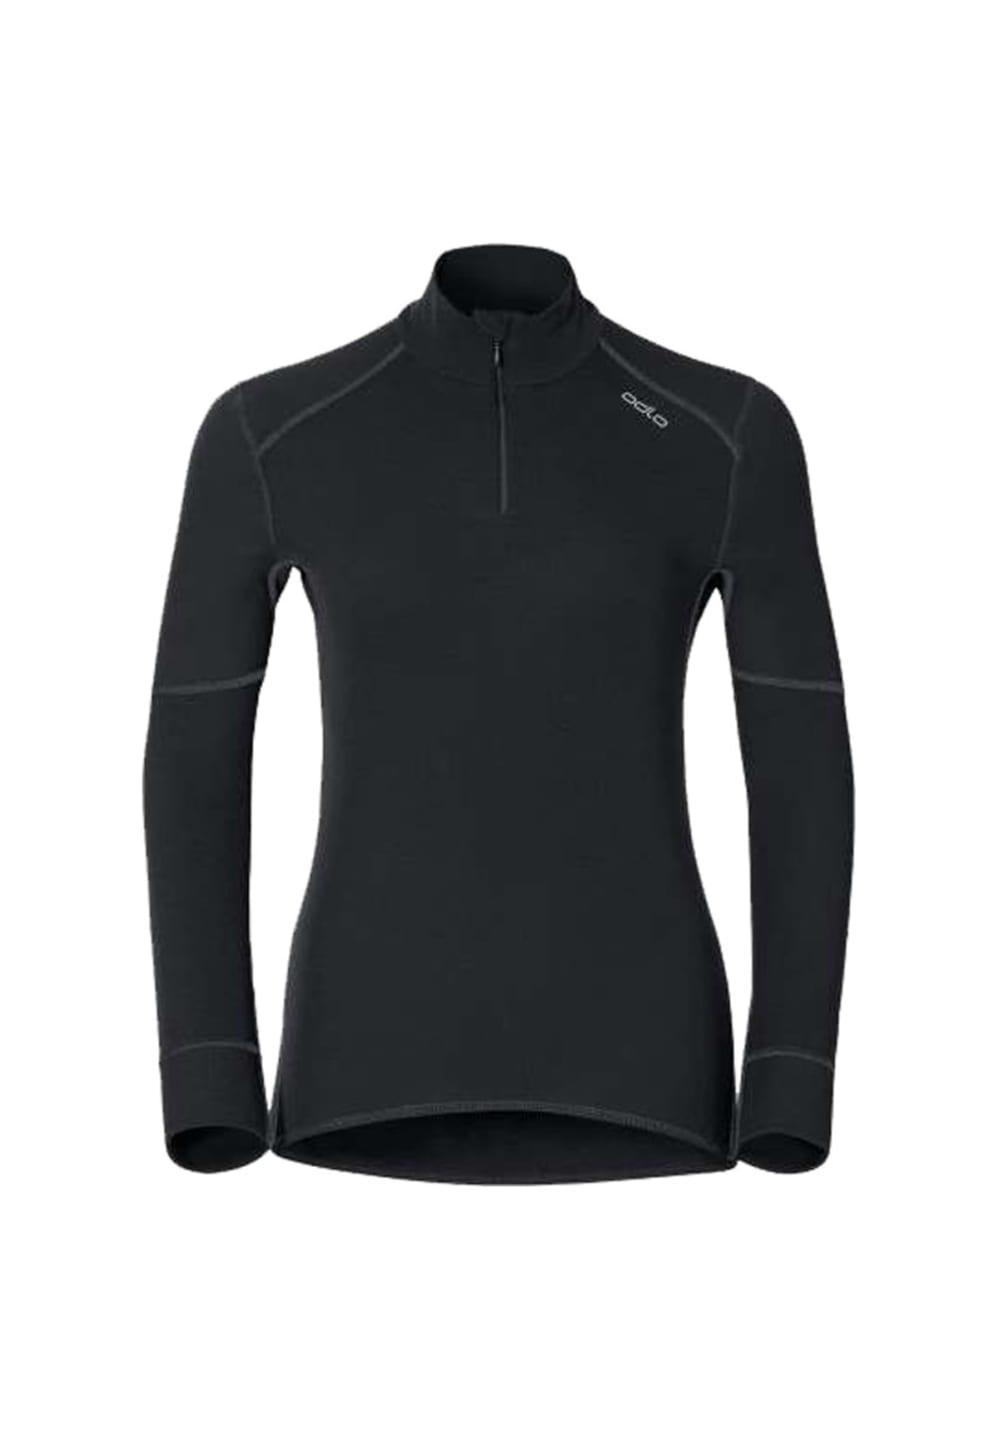 Odlo Longsleeve Shirt 1/2 Zip Turtle Neck X-Warm - Funktionsunterwäsche für Da